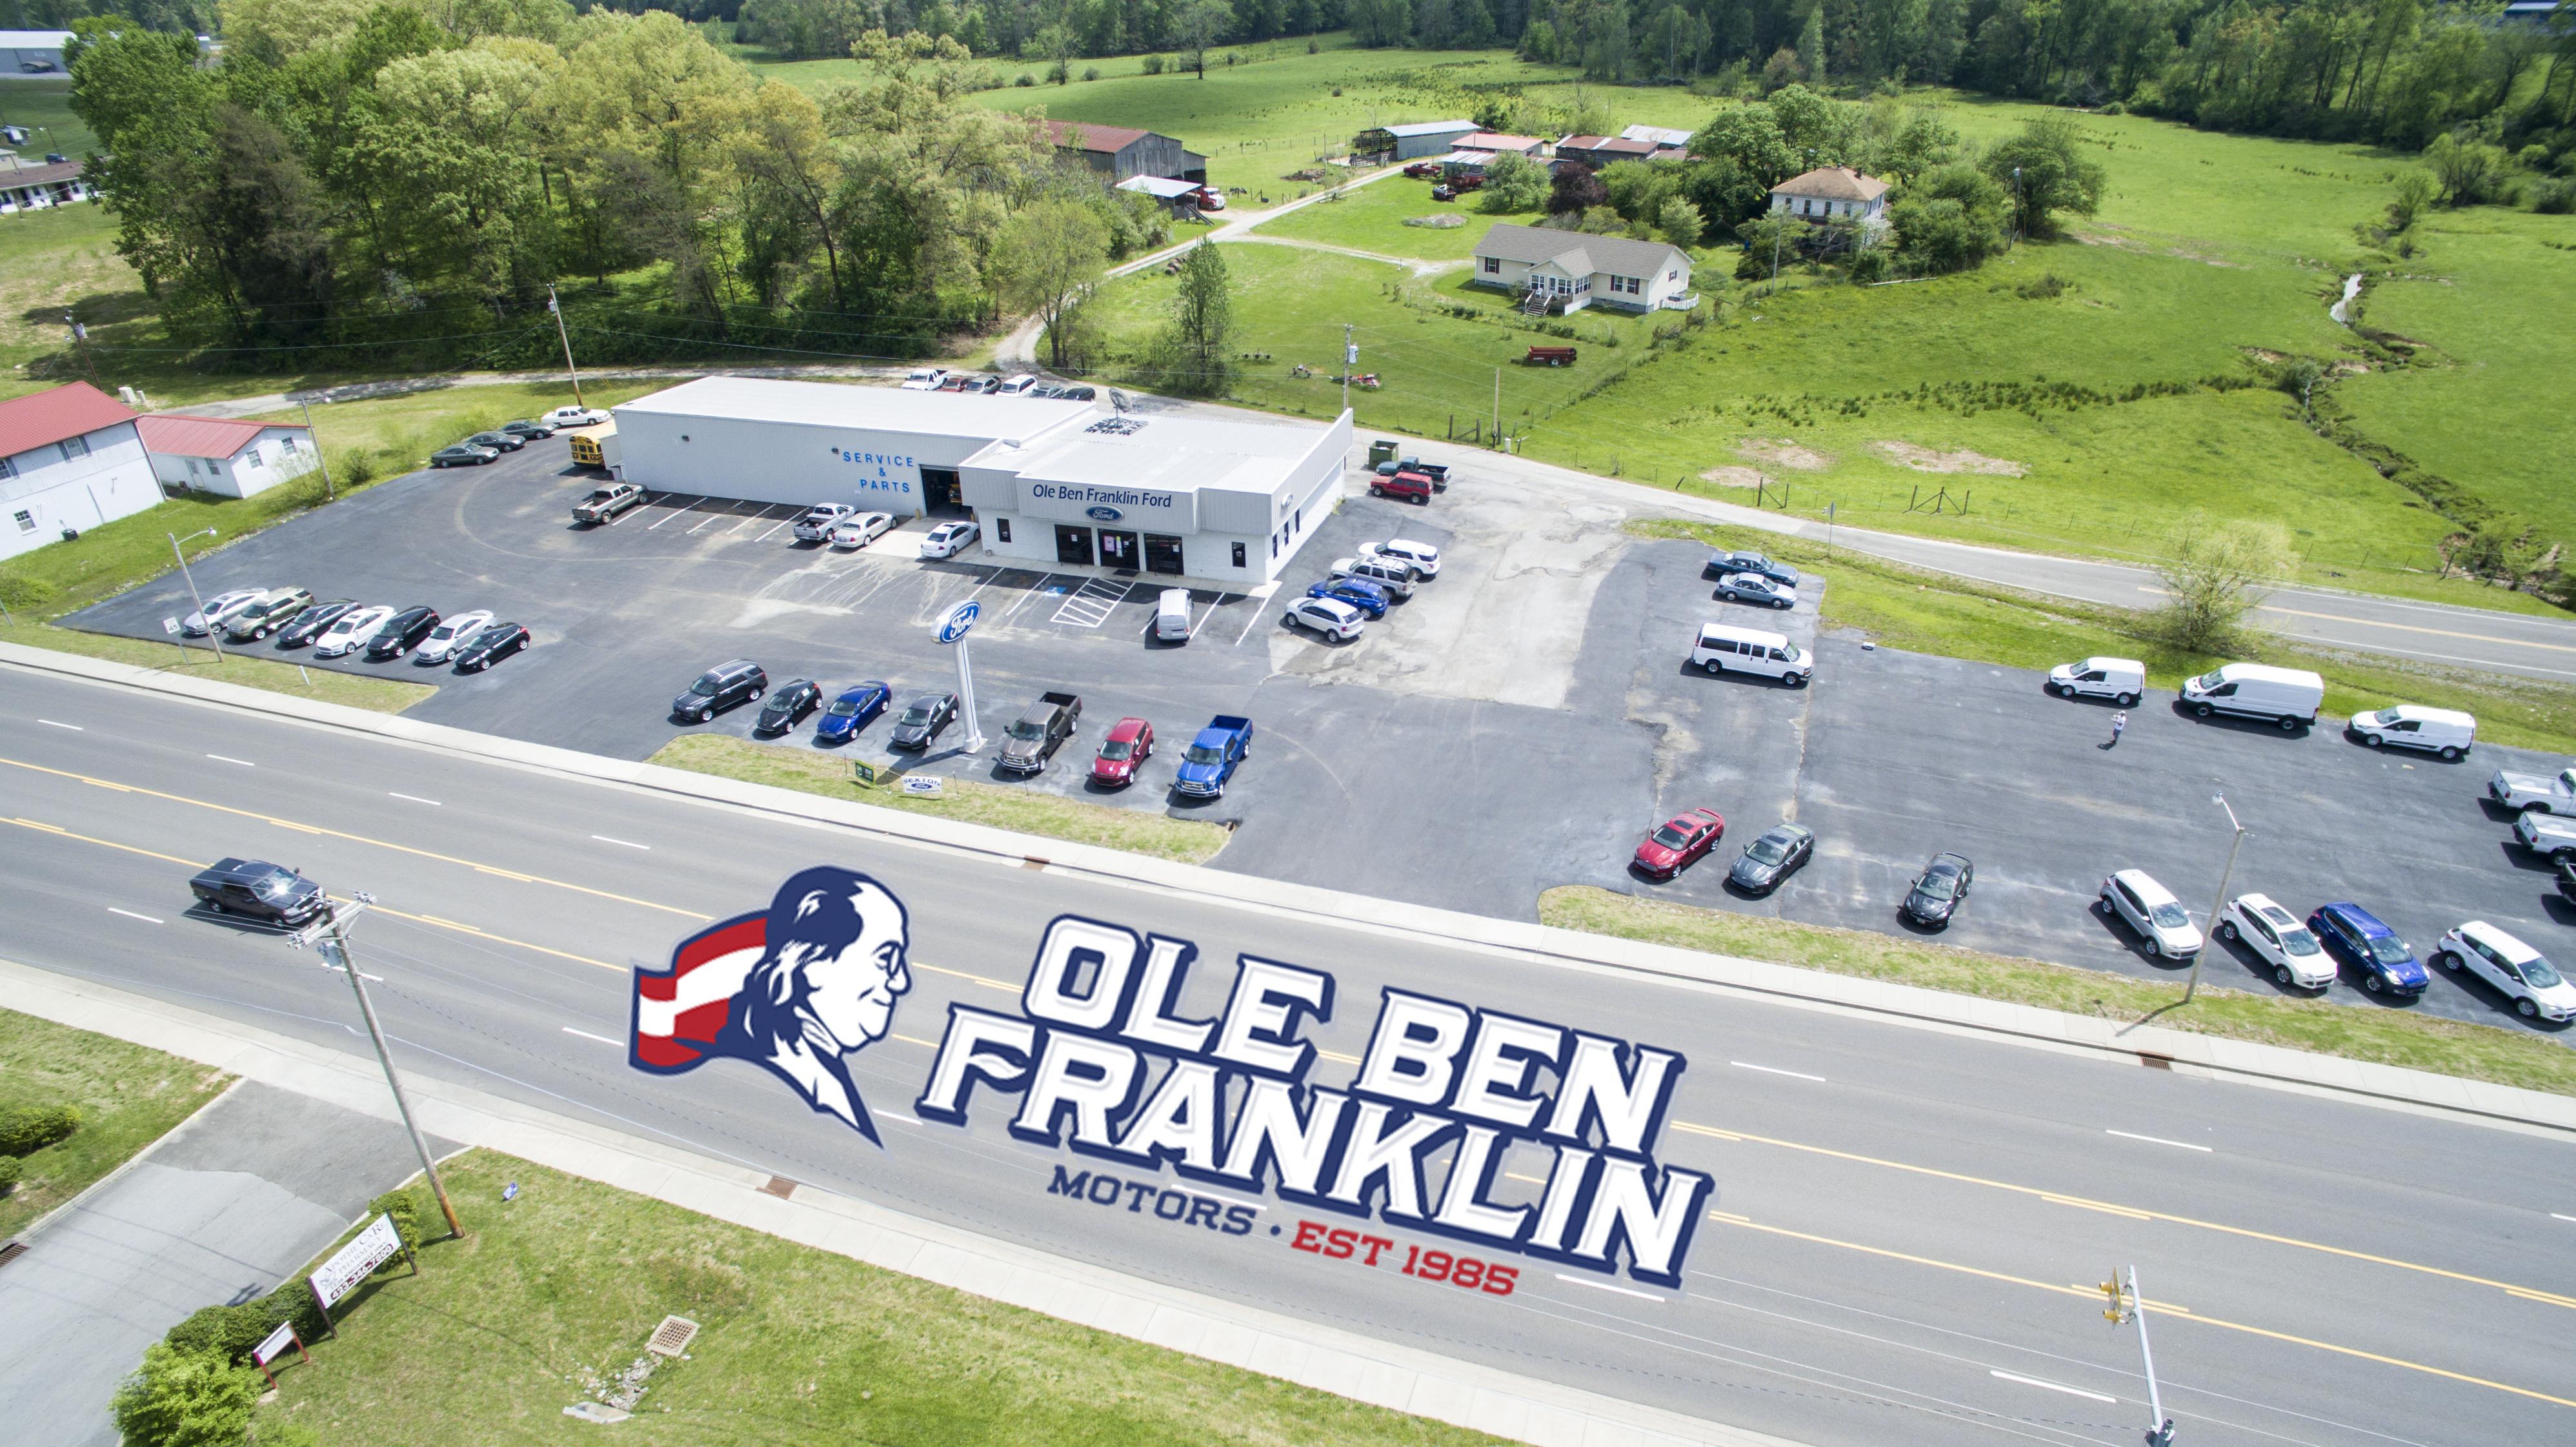 Ole ben franklin ford 1226 knoxville hwy wartburg tn for Ben franklin motors knoxville tn